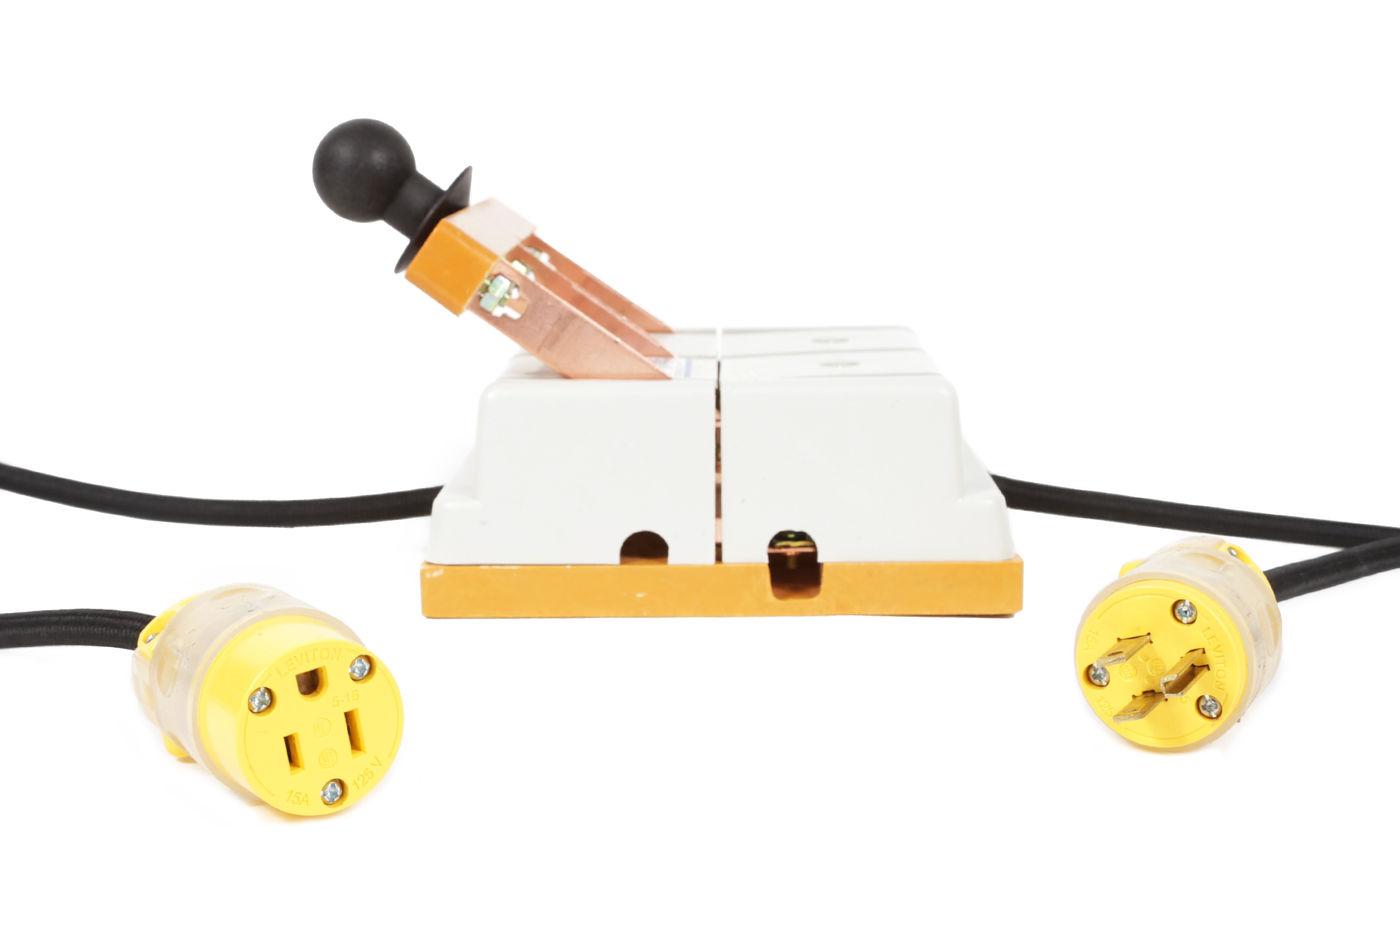 Affix the Socket and Plug